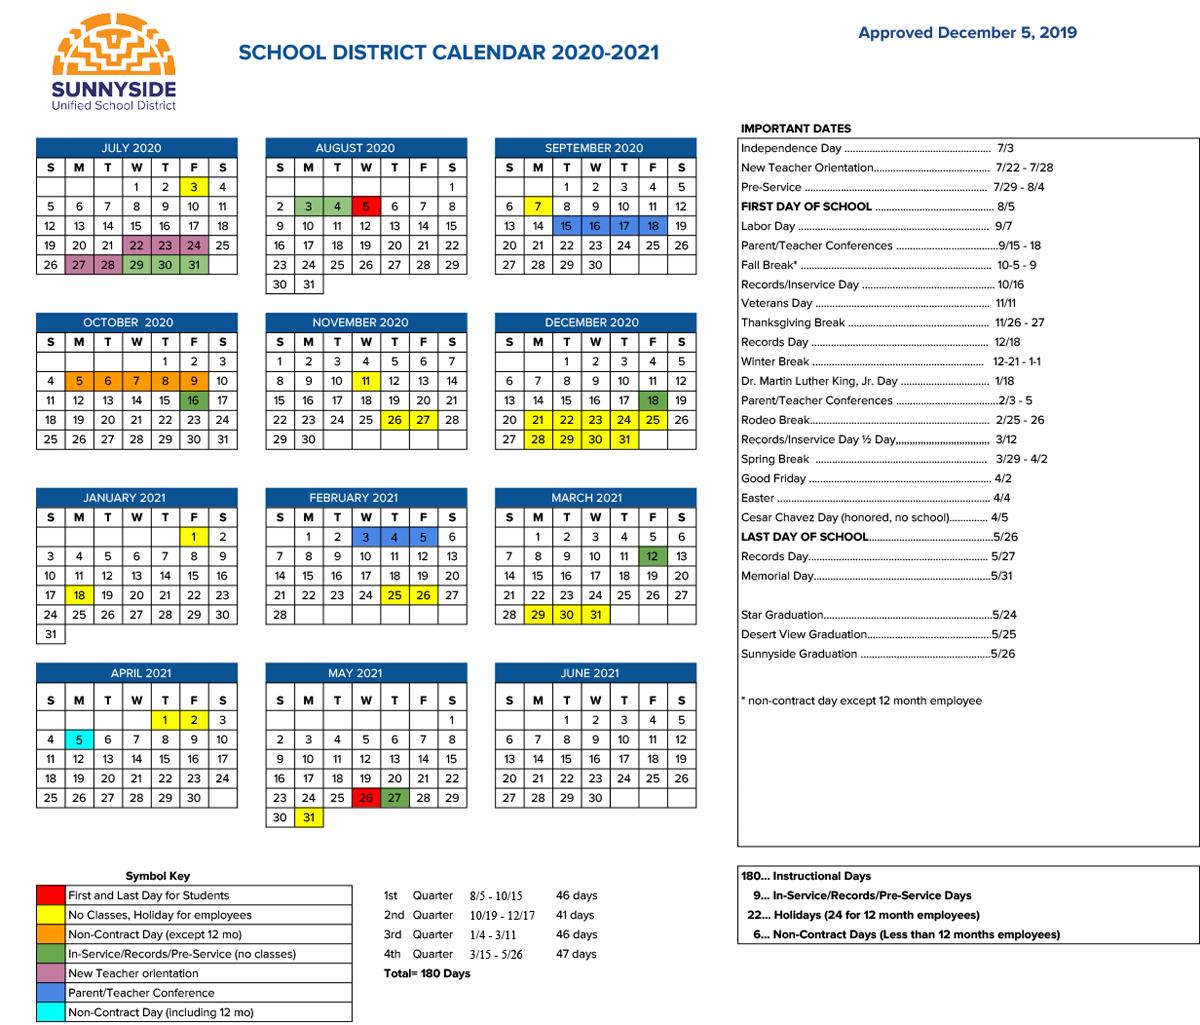 Academic Calendar | Sunnyside Unified School District Throughout East Orange H S Calendar